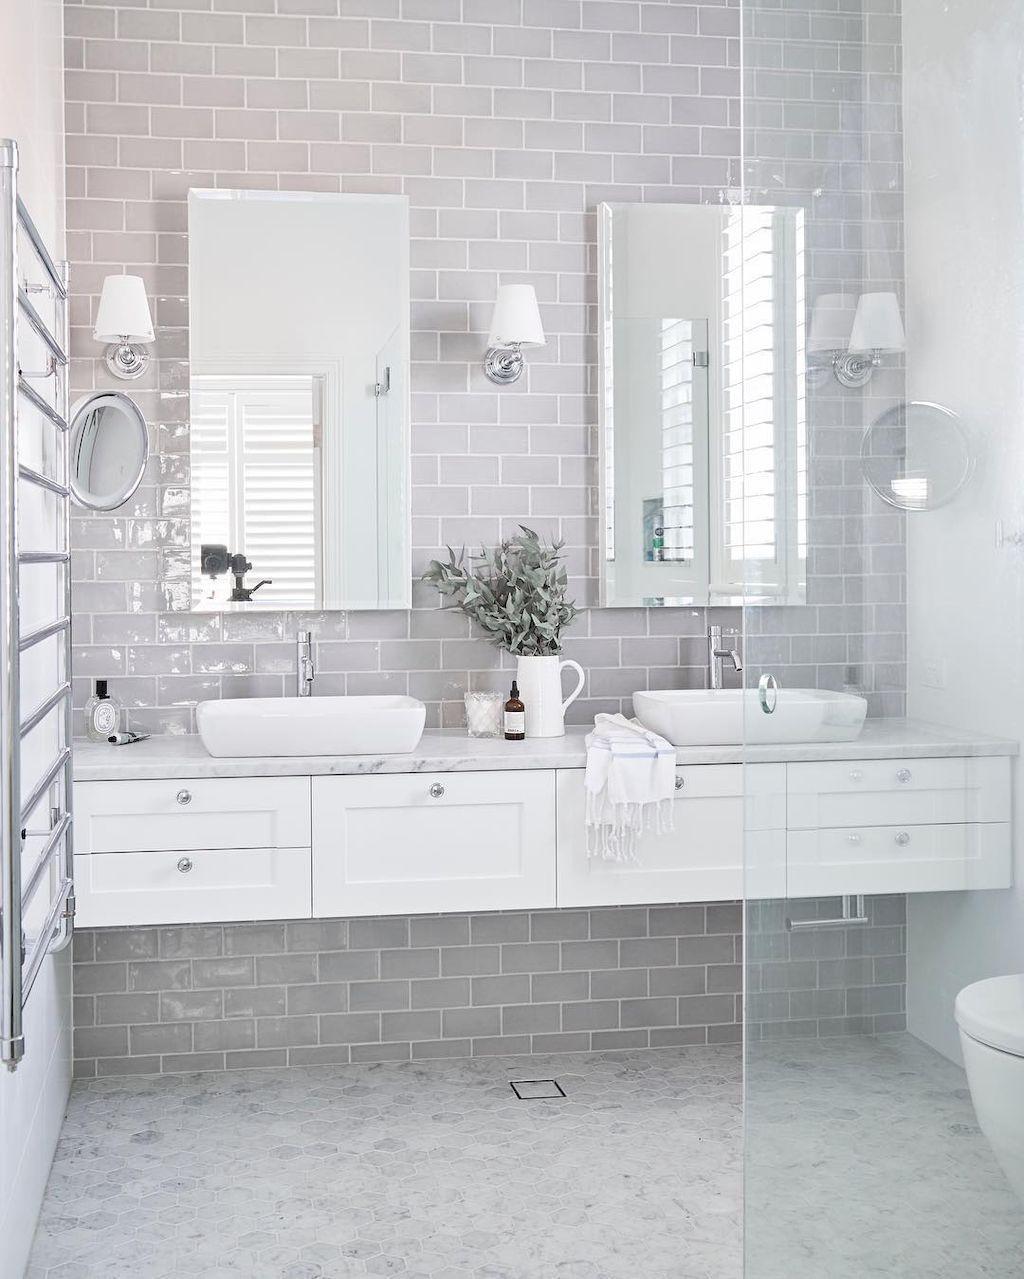 Cool small master bathroom remodel ideas (35 | Master bathroom ...